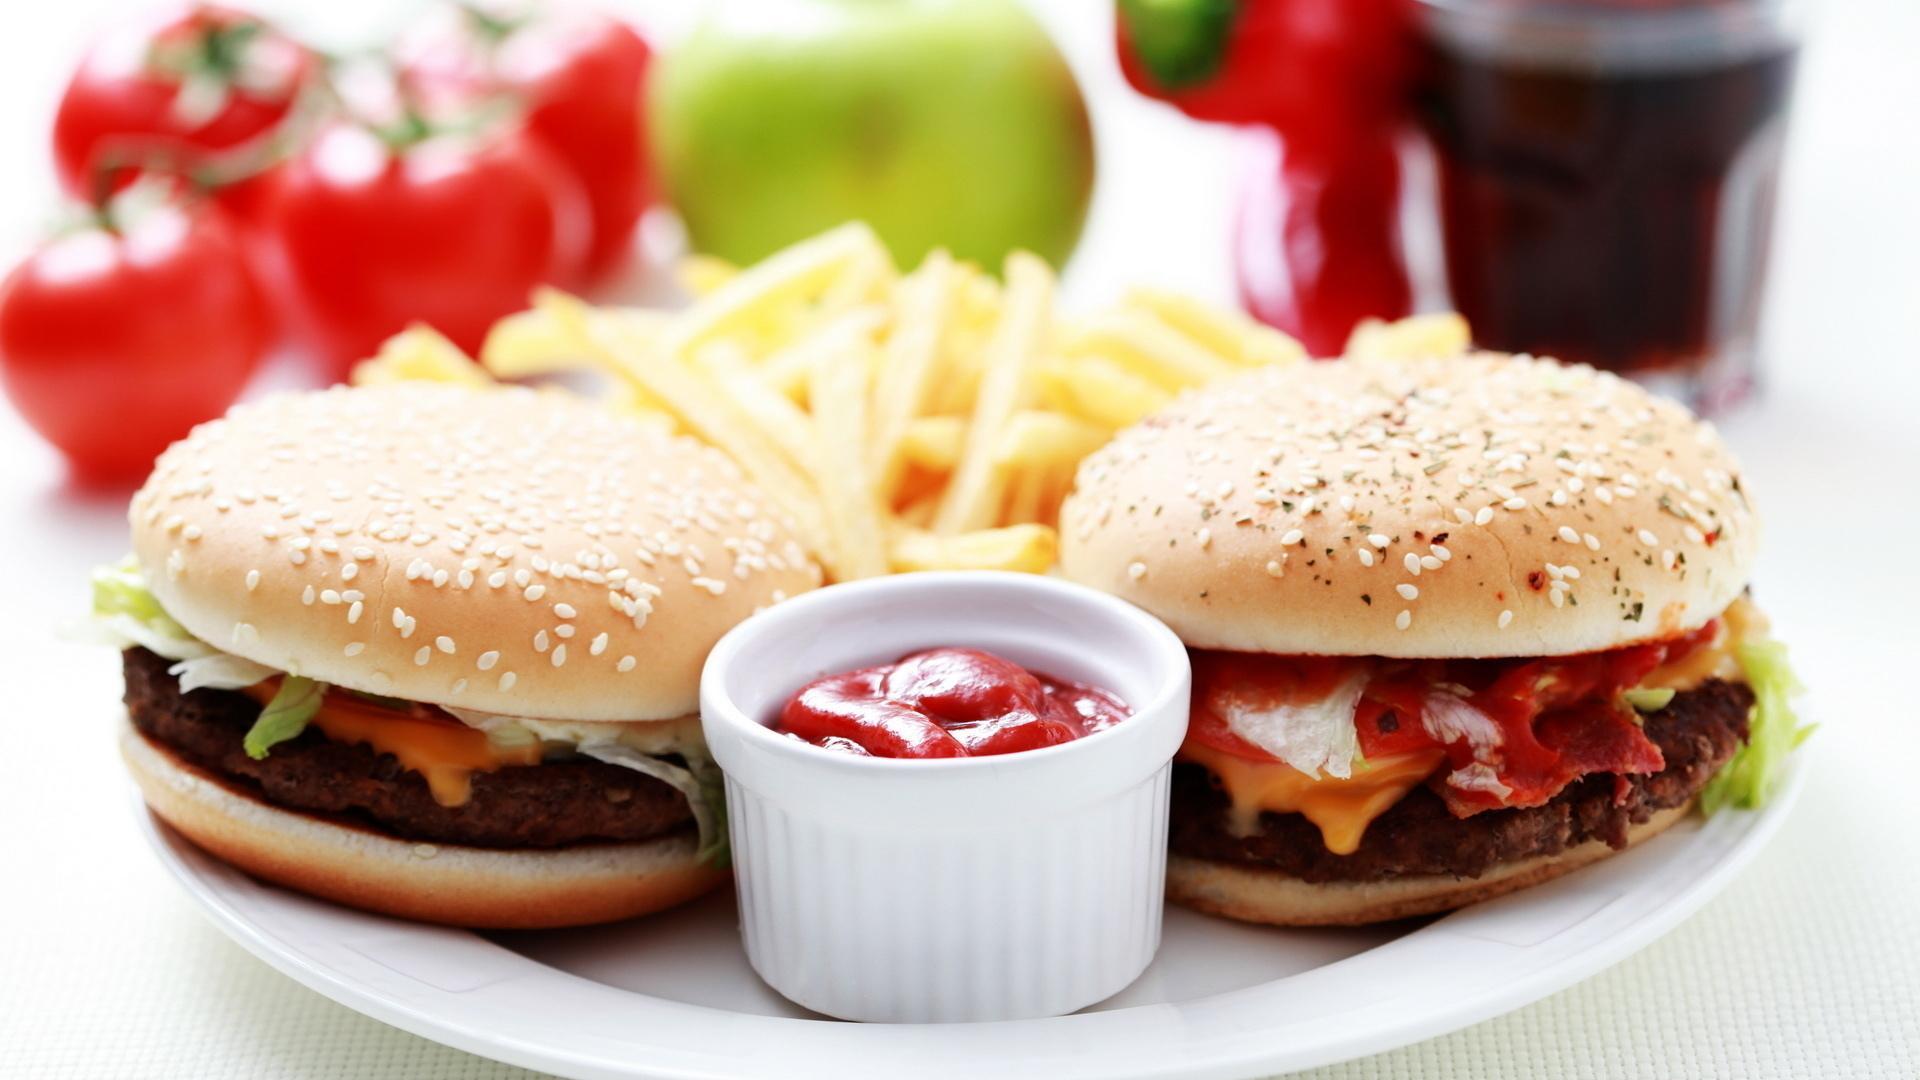 Must see Wallpaper High Quality Burger - 13_burger  Pic_614388.jpg